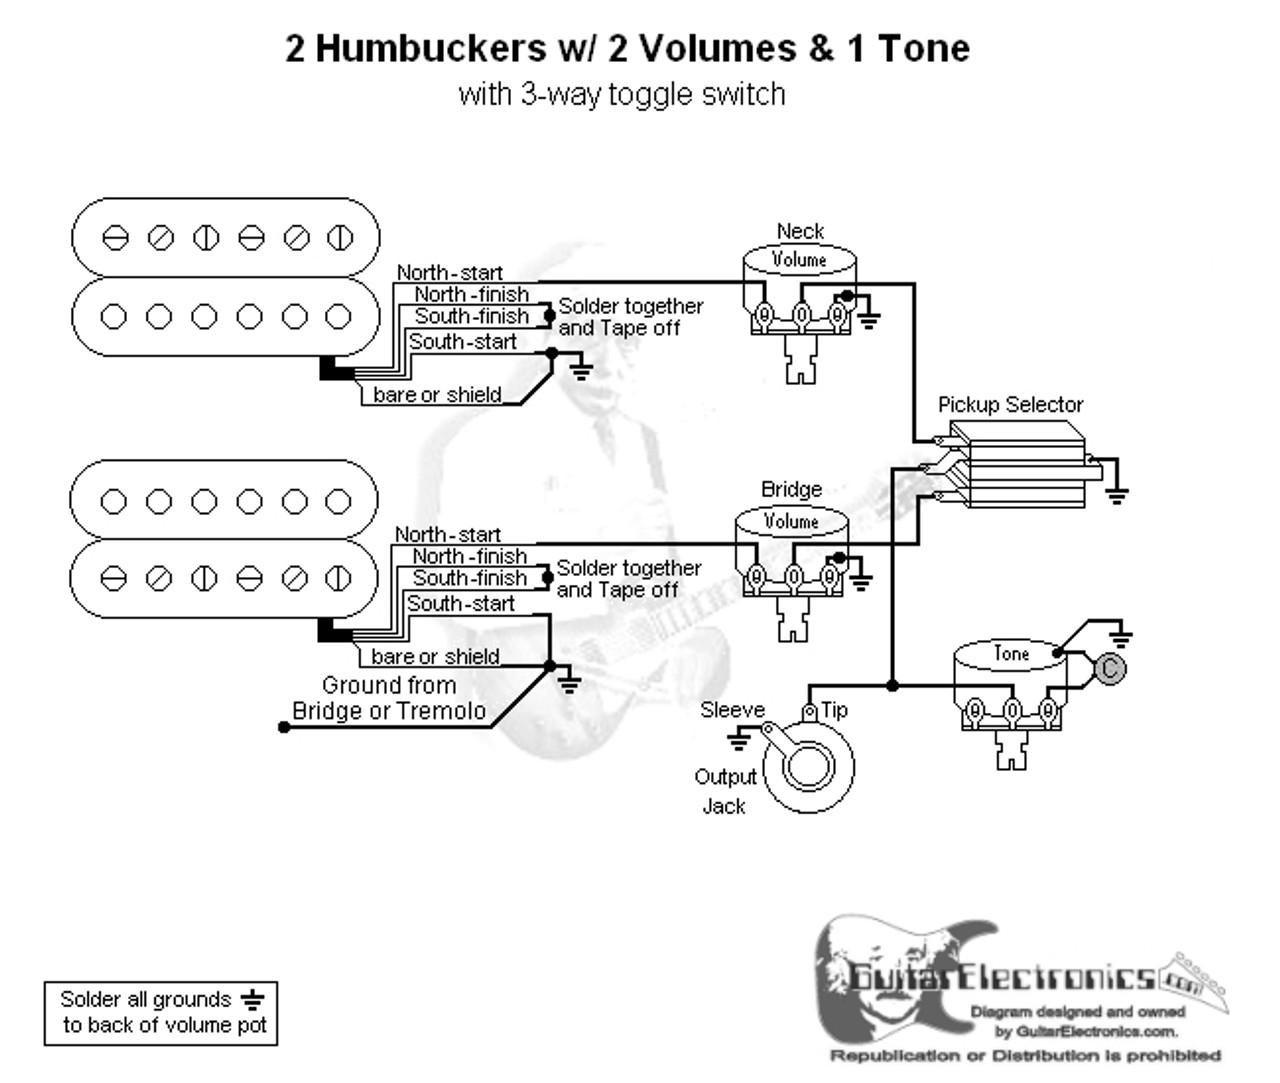 medium resolution of electric guitar diagram wire 2 humbucker 1 tones 2 volumes wiring wiring diagram 2 pickup 3 way switch one volume